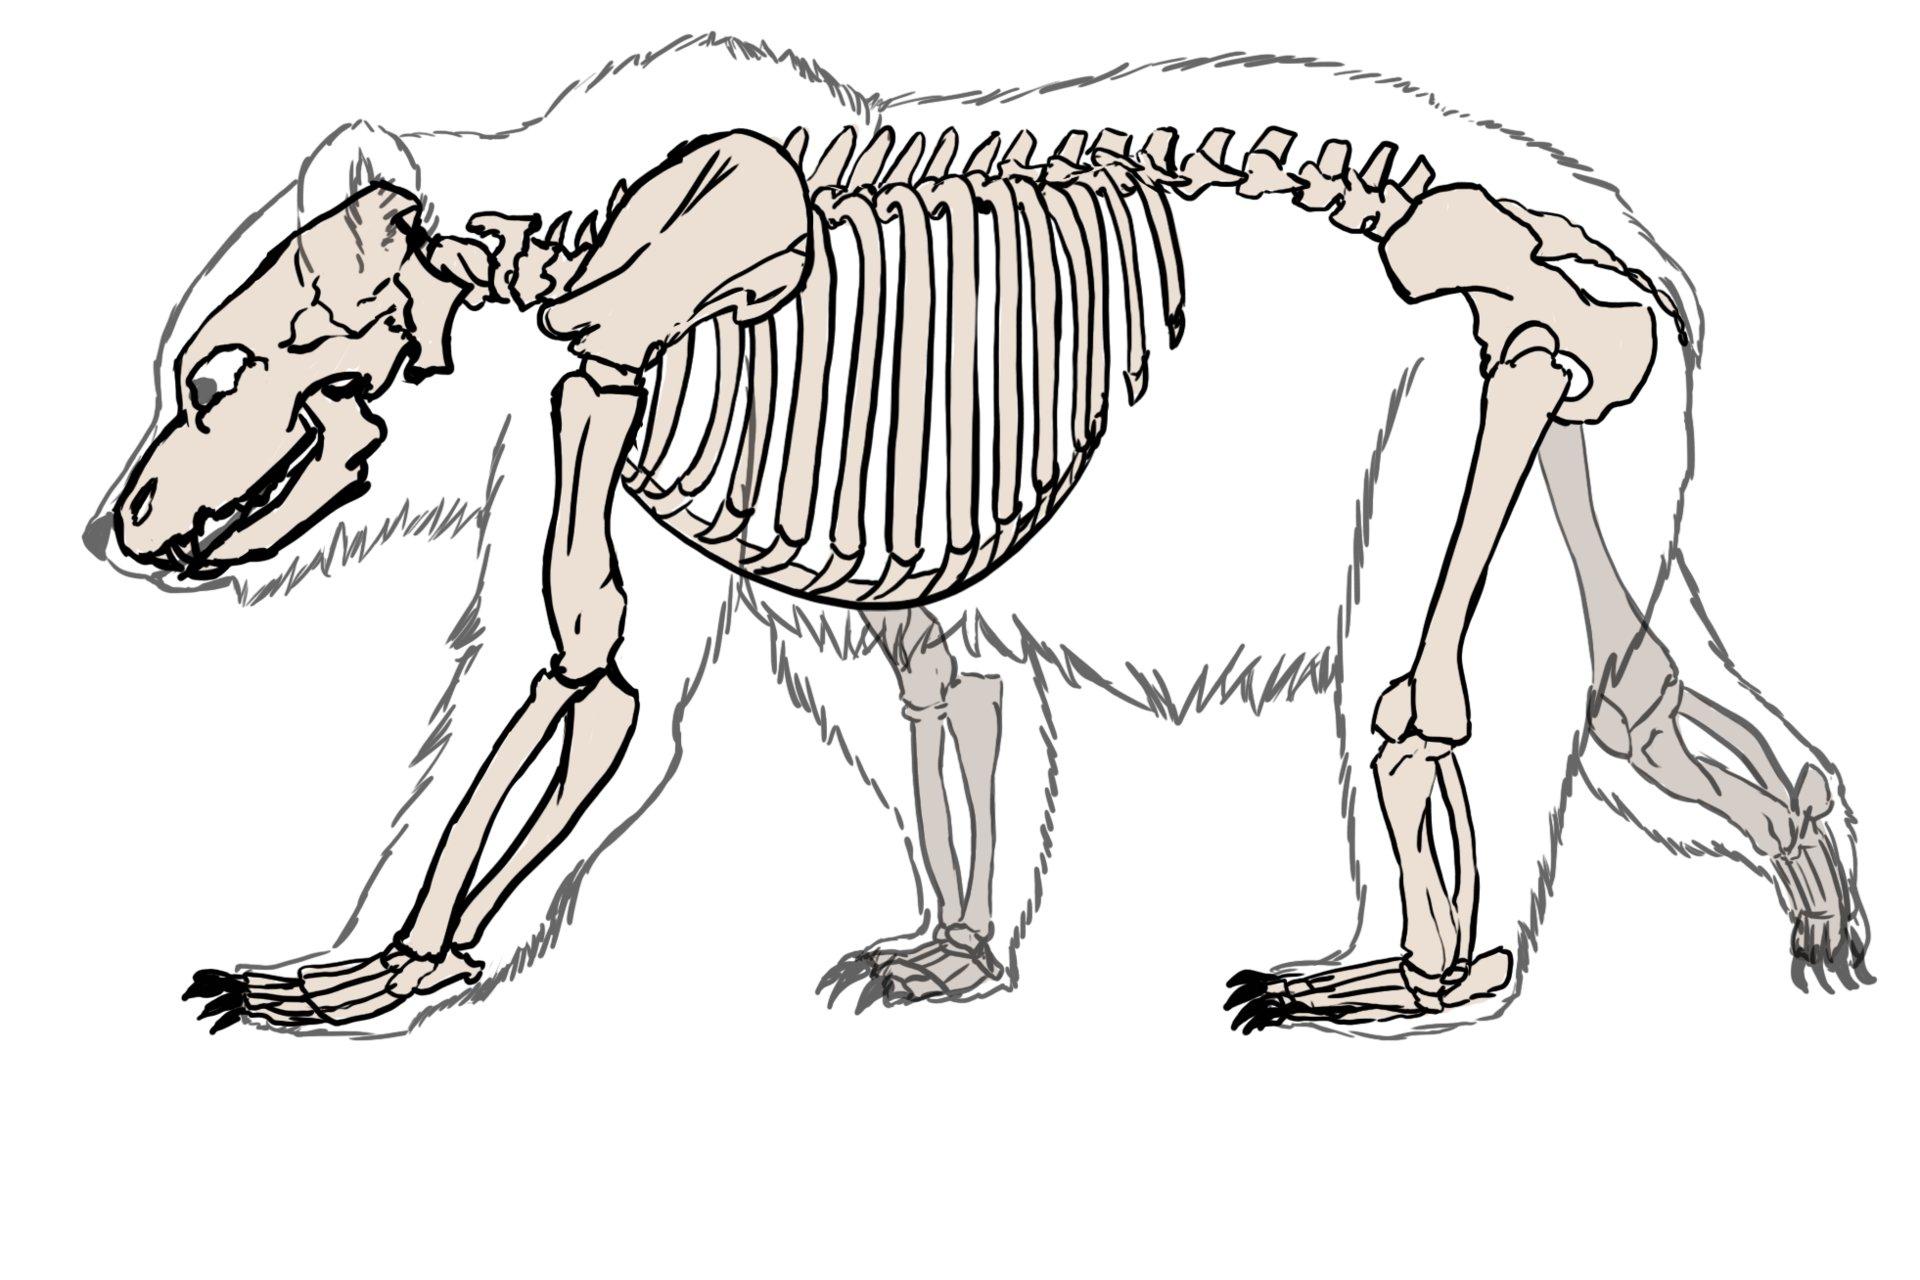 bear skull diagram 1999 dodge ram 1500 front axle artstation skeleton illustration kieran polaris